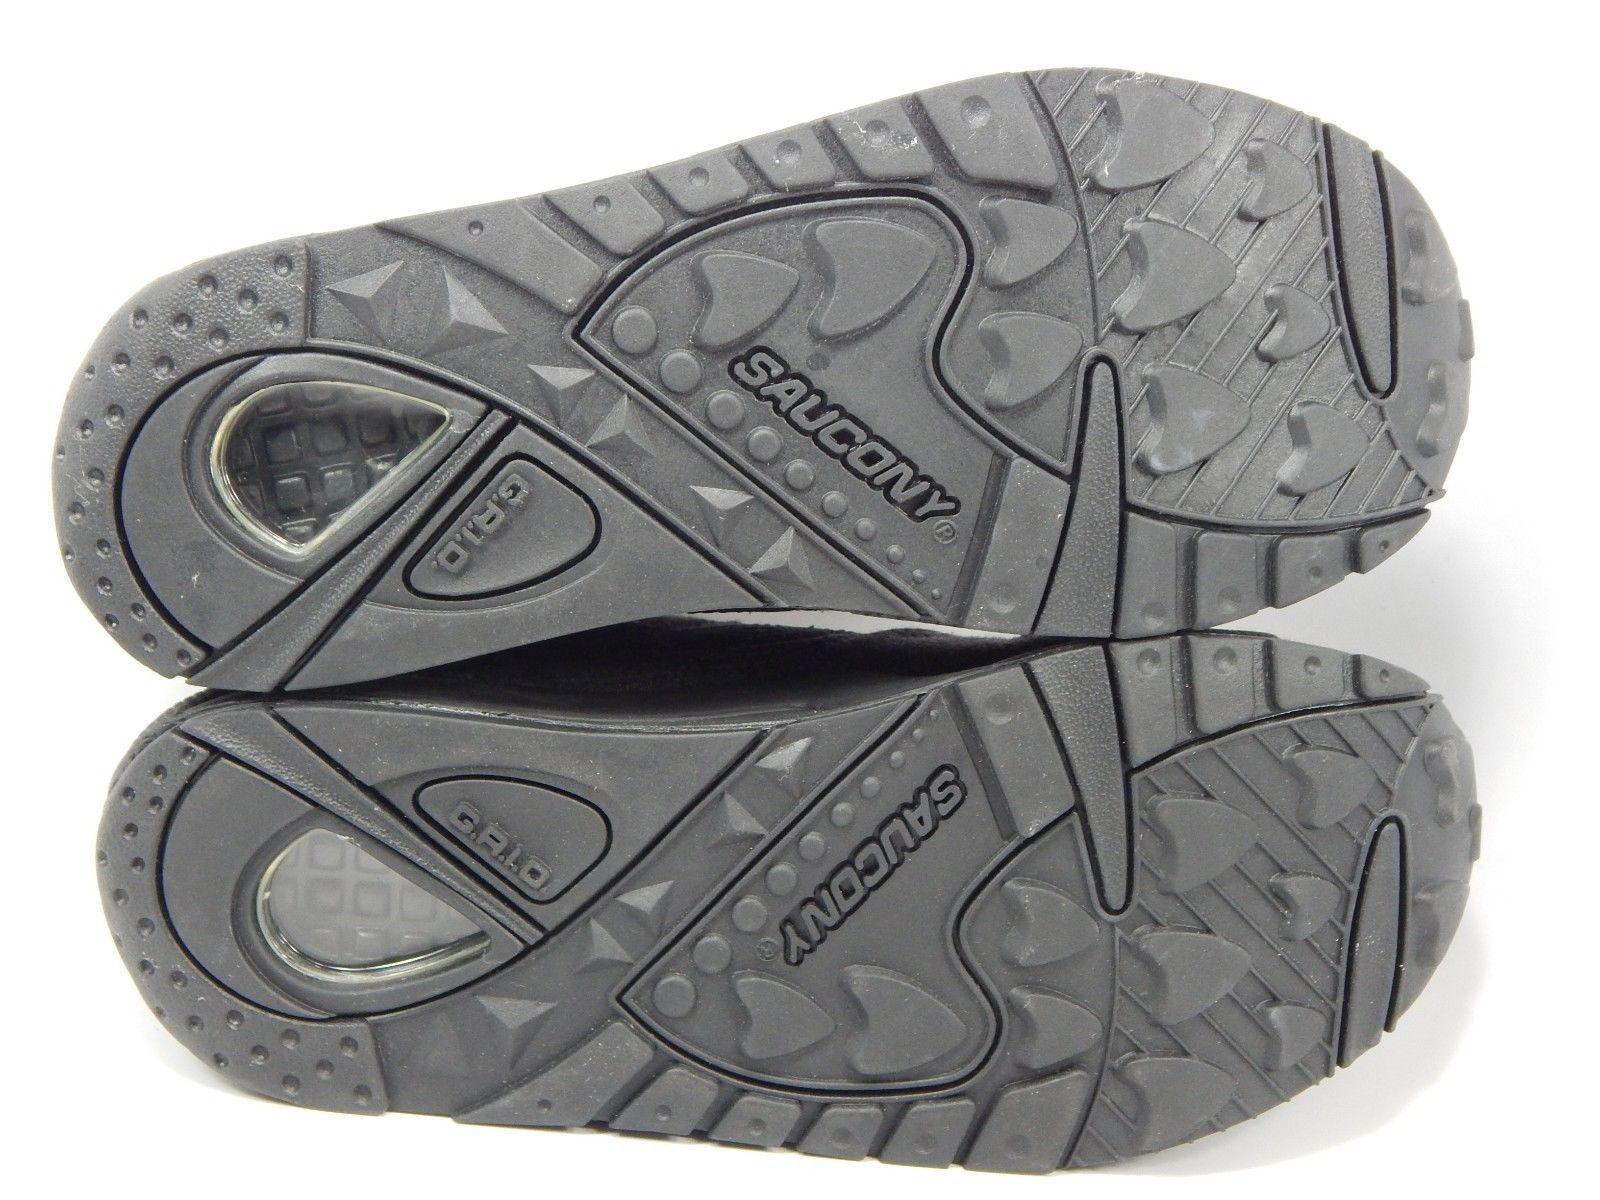 Saucony Grid 9000 HT Original S60348-1 Women's Running Shoes Size 7 M (B) EU 38